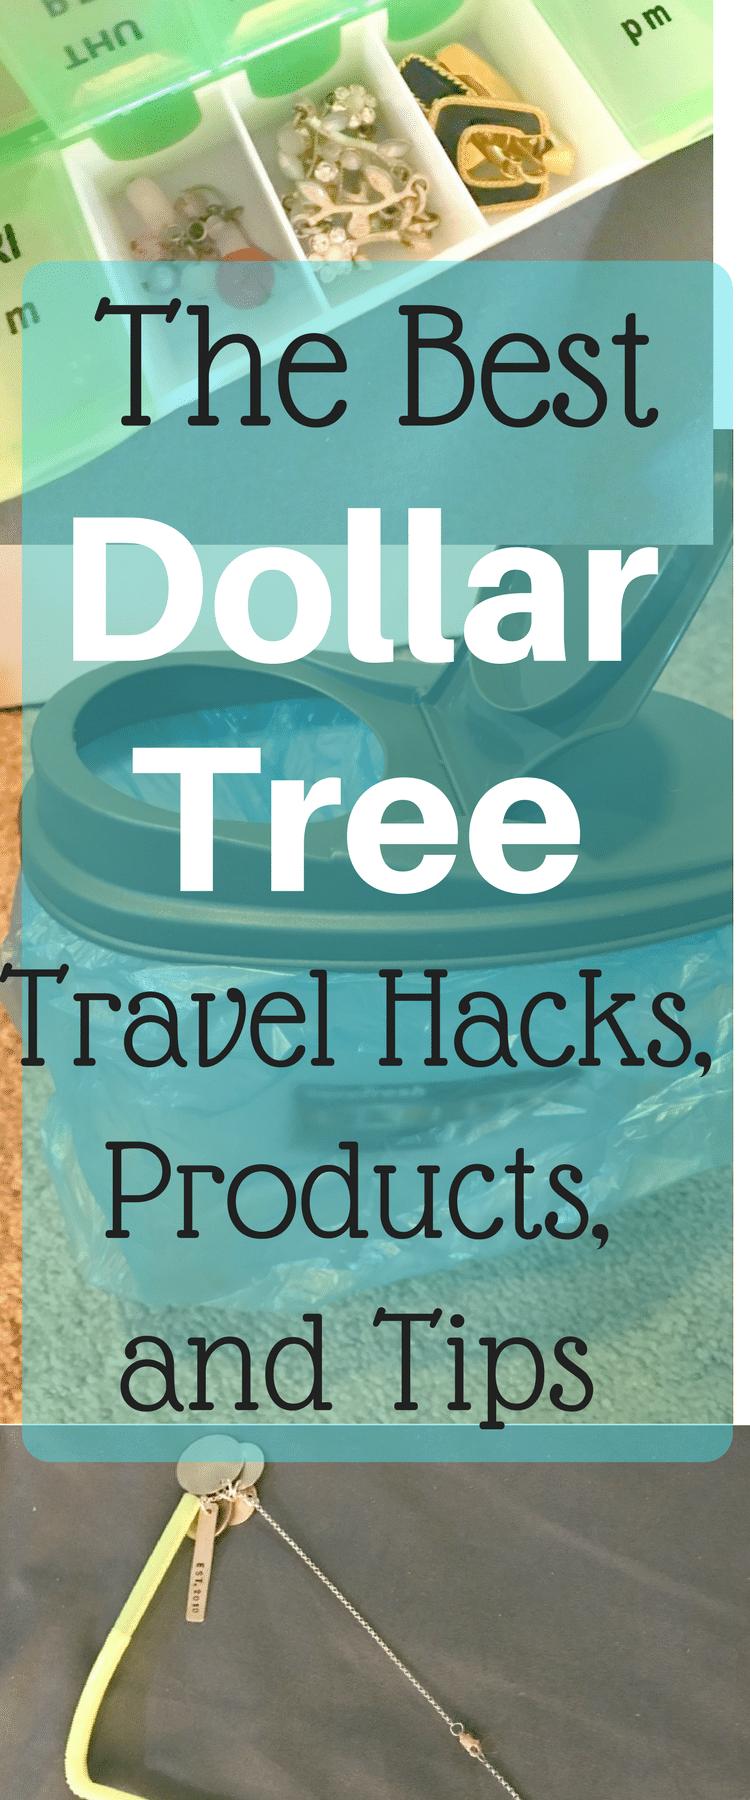 Dollar Tree Travel Hacks / Dollar Tree Hacks / Dollar Tree Tips / Dollar Tree Products / Travel Tips / Family Travel / Travel Hacks / Dollar Store Tips / Dollar Store Travel